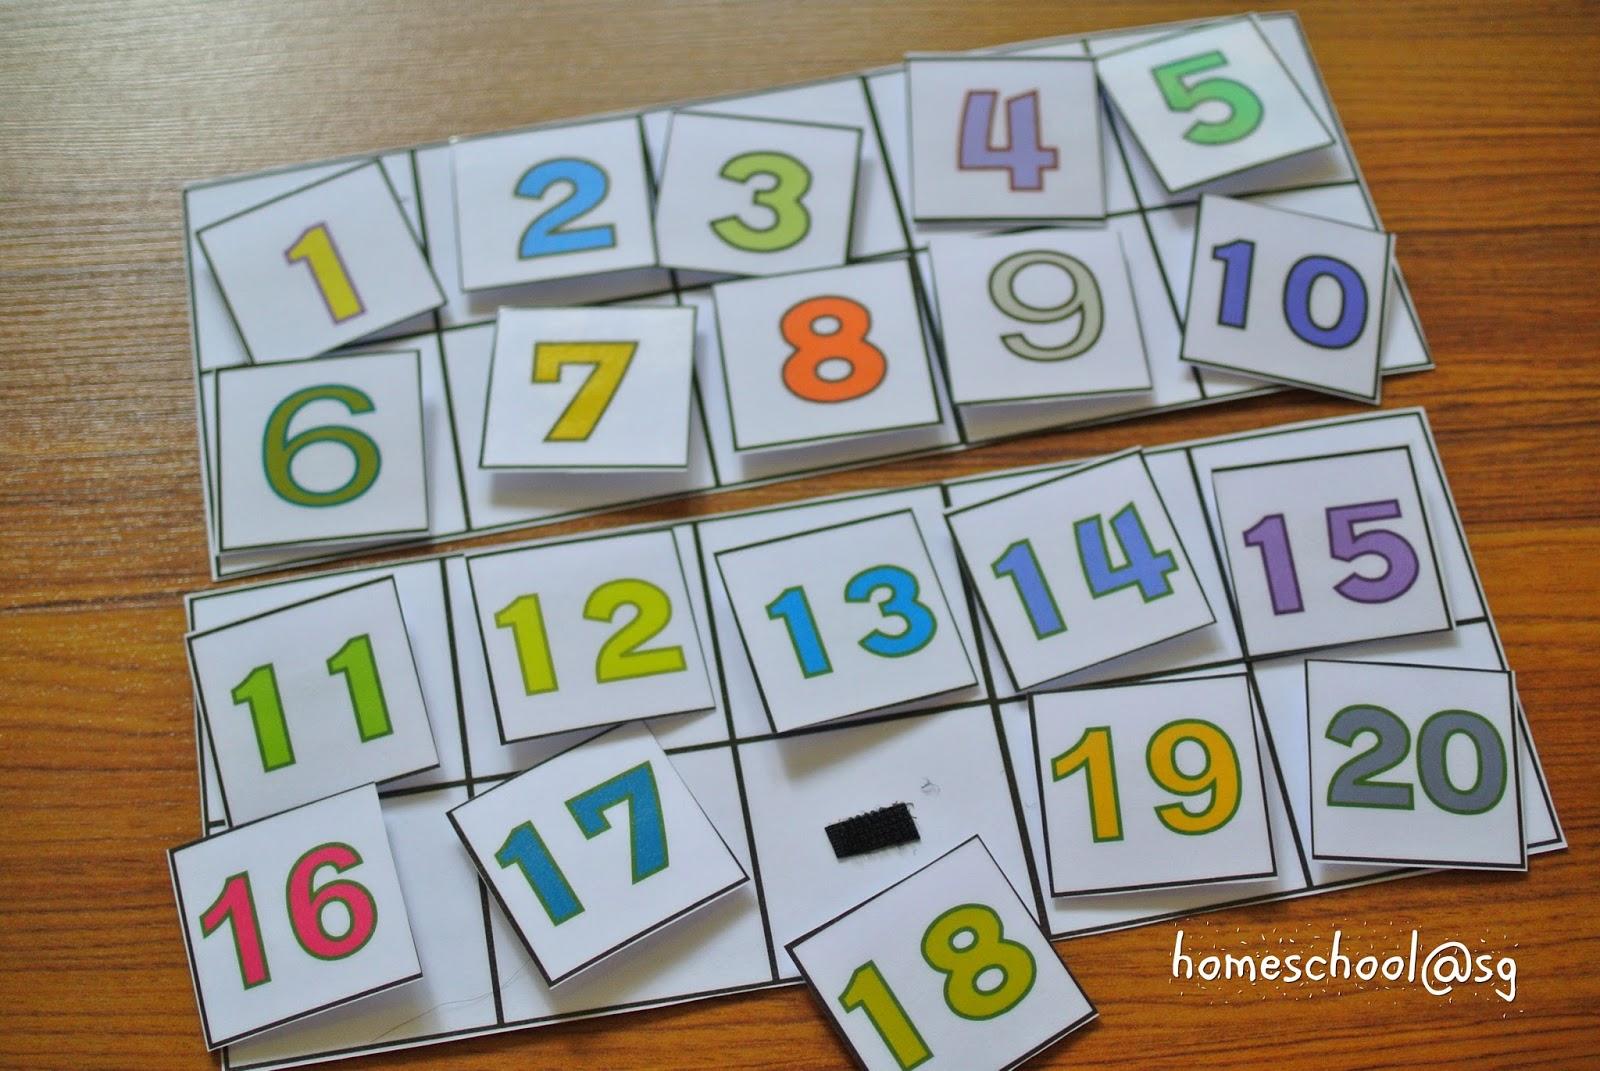 Homeschool@sg: Homemade Printables